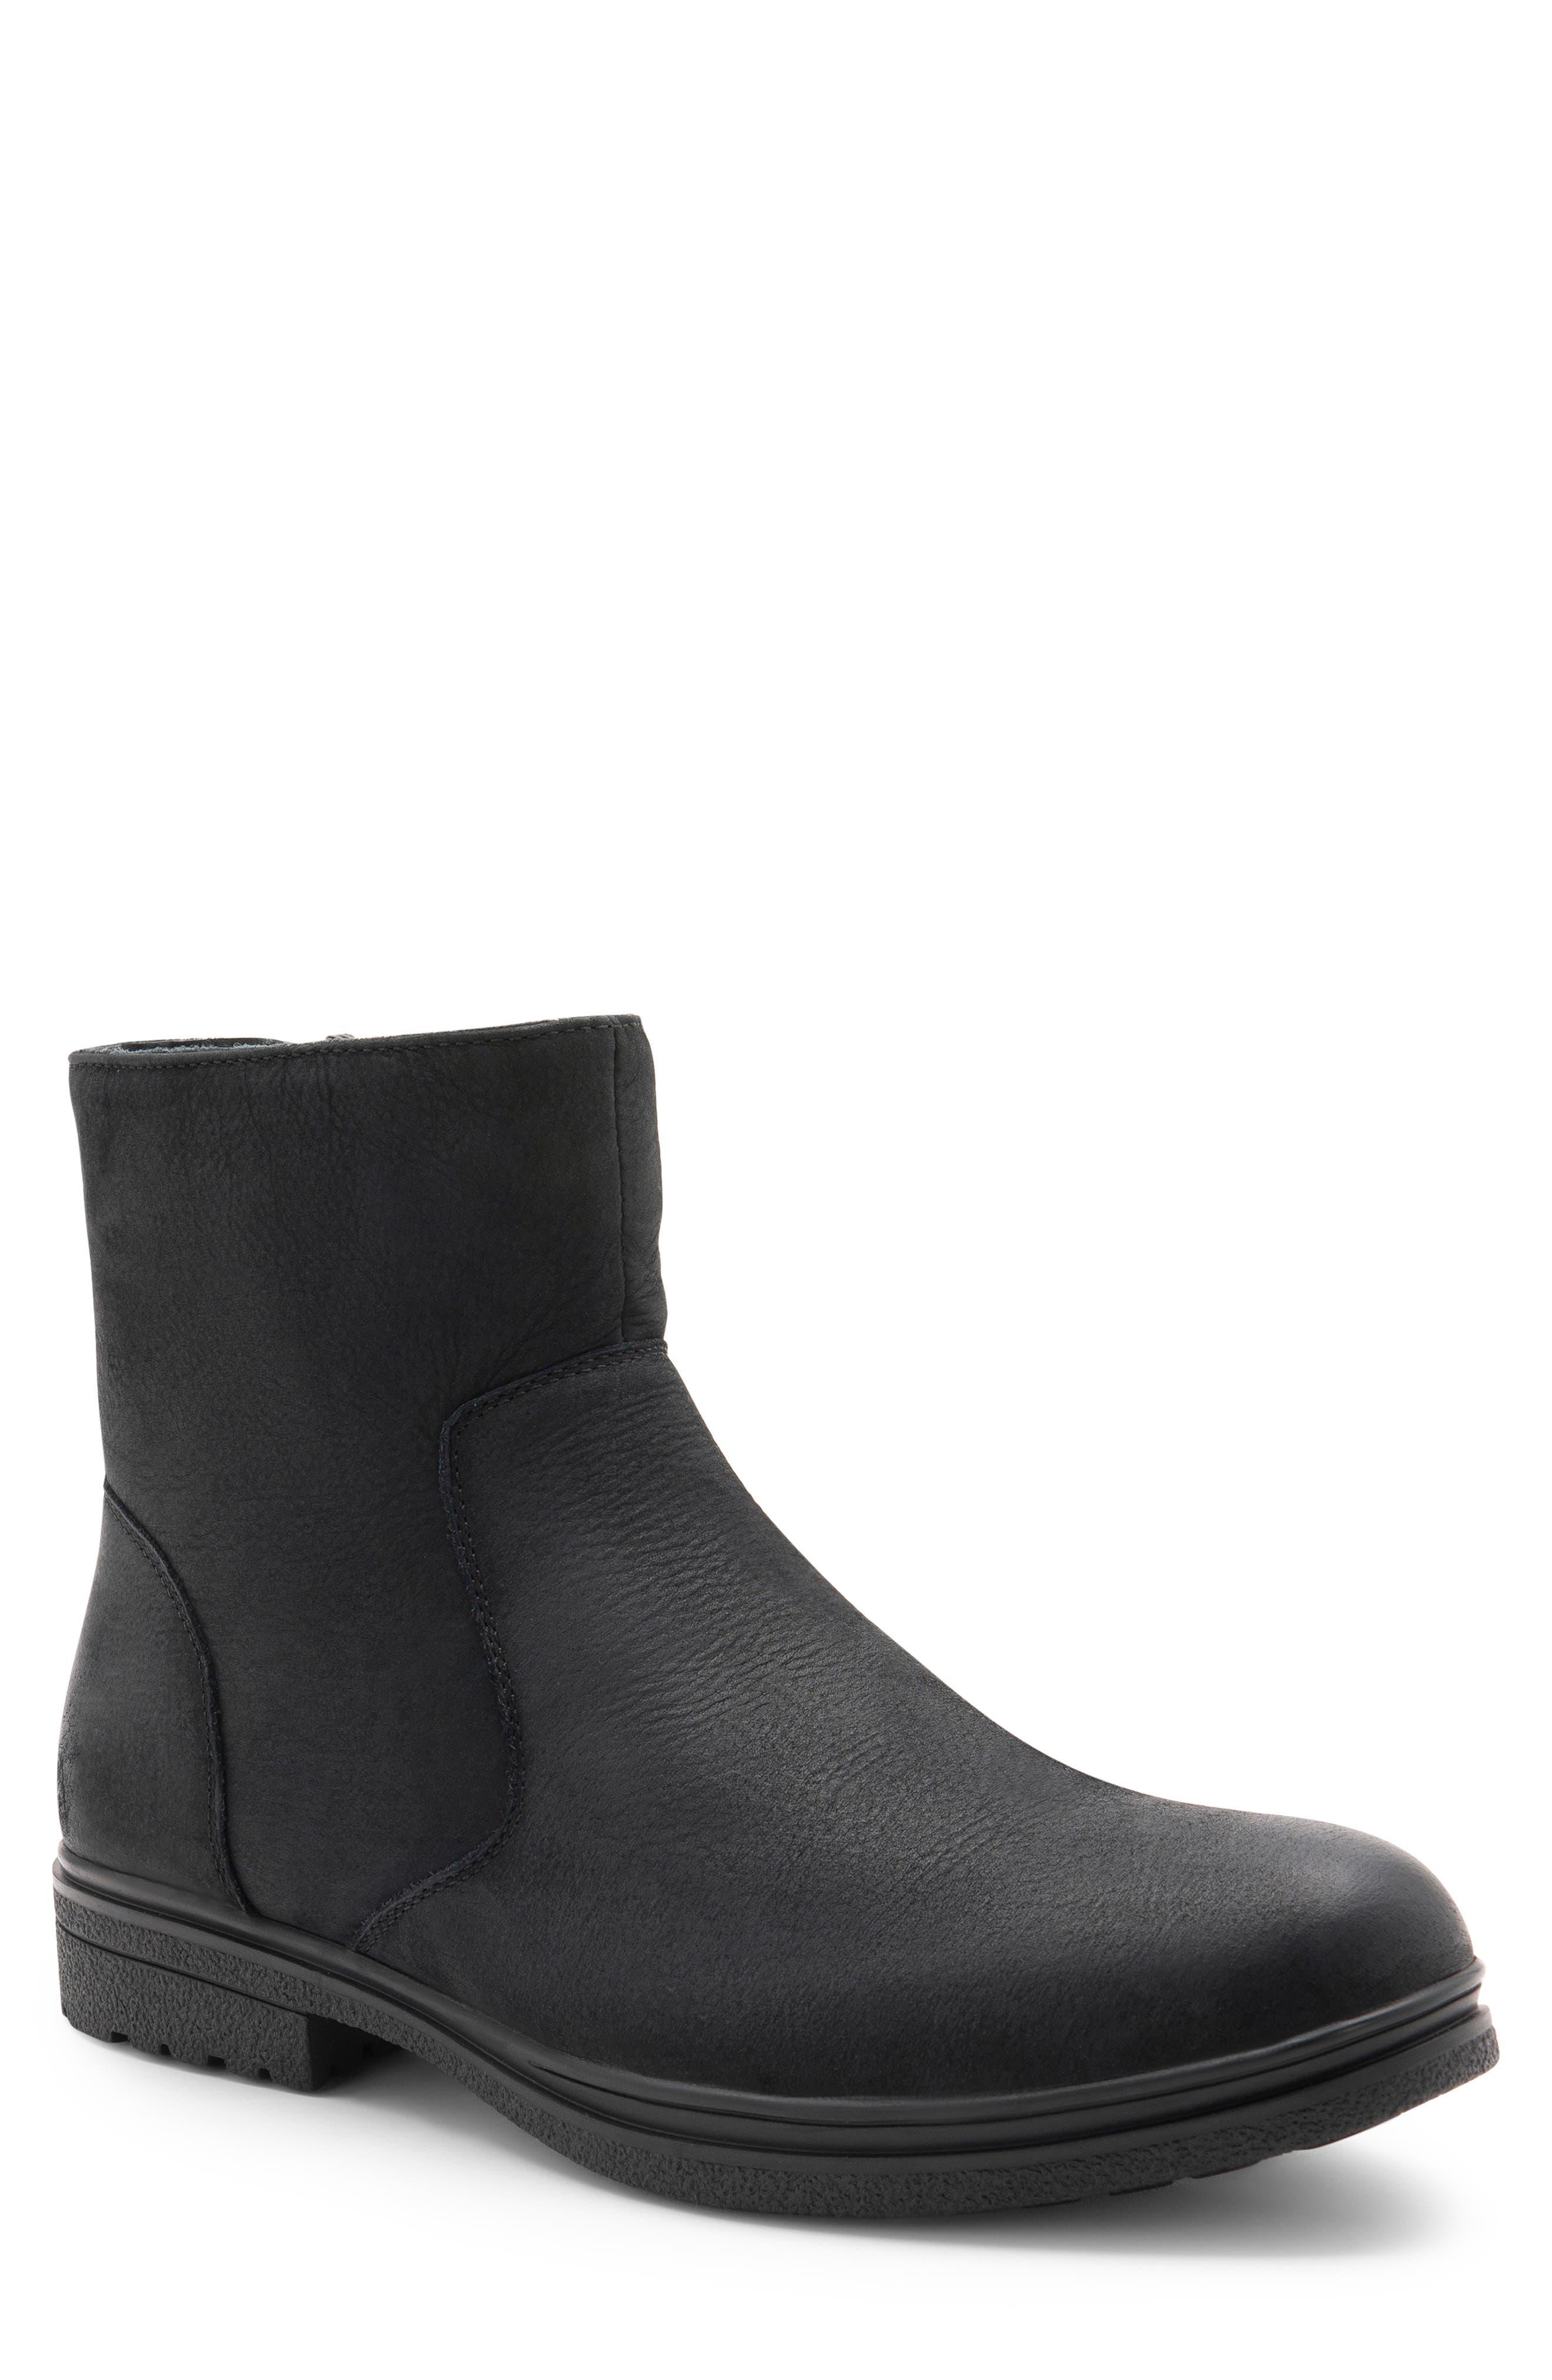 Blondo Sylvio Waterproof Zip Boot- Black